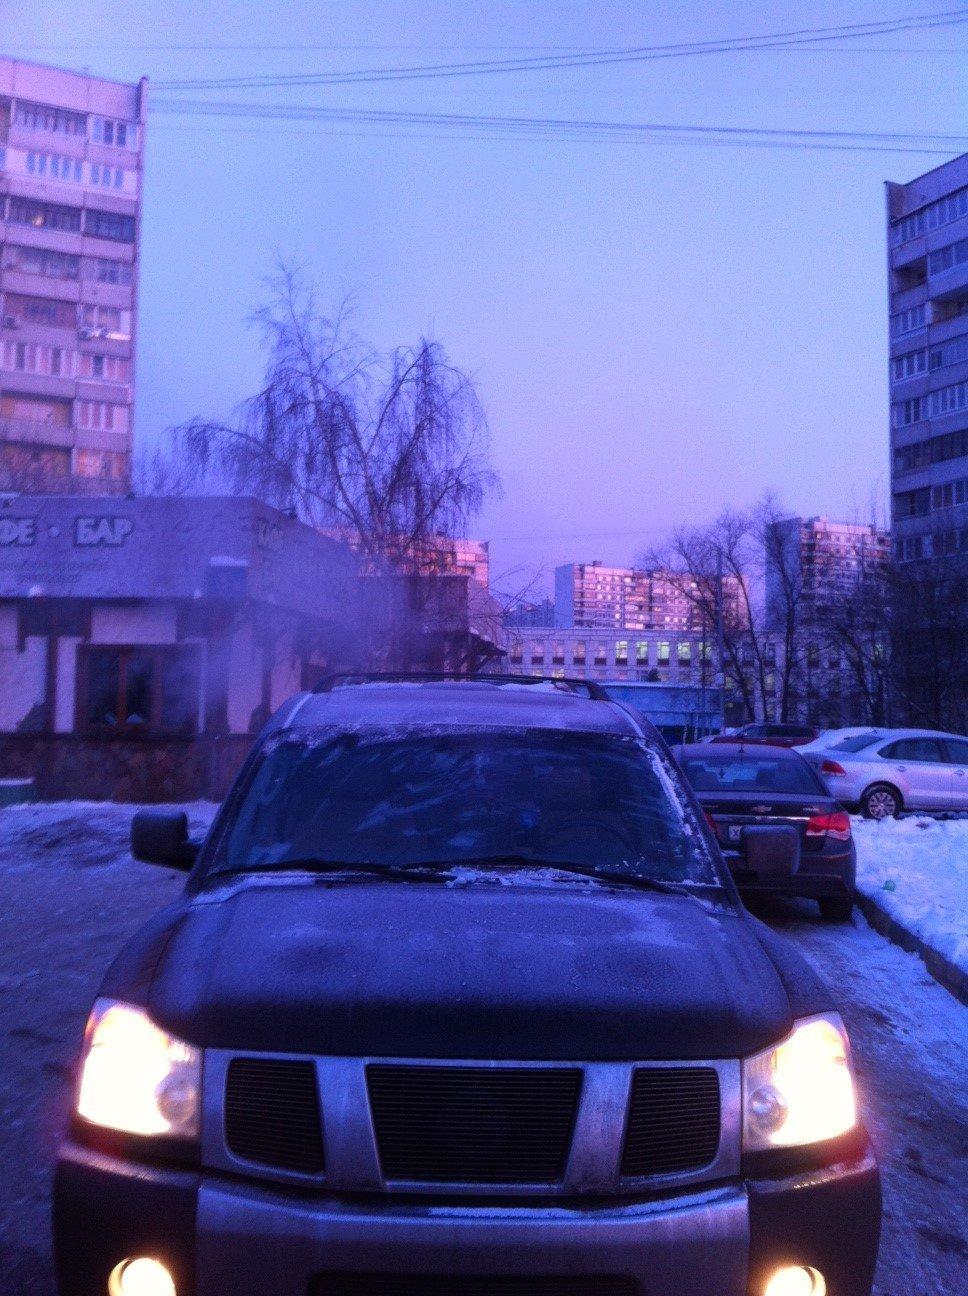 Прекрасное зимнее утро.